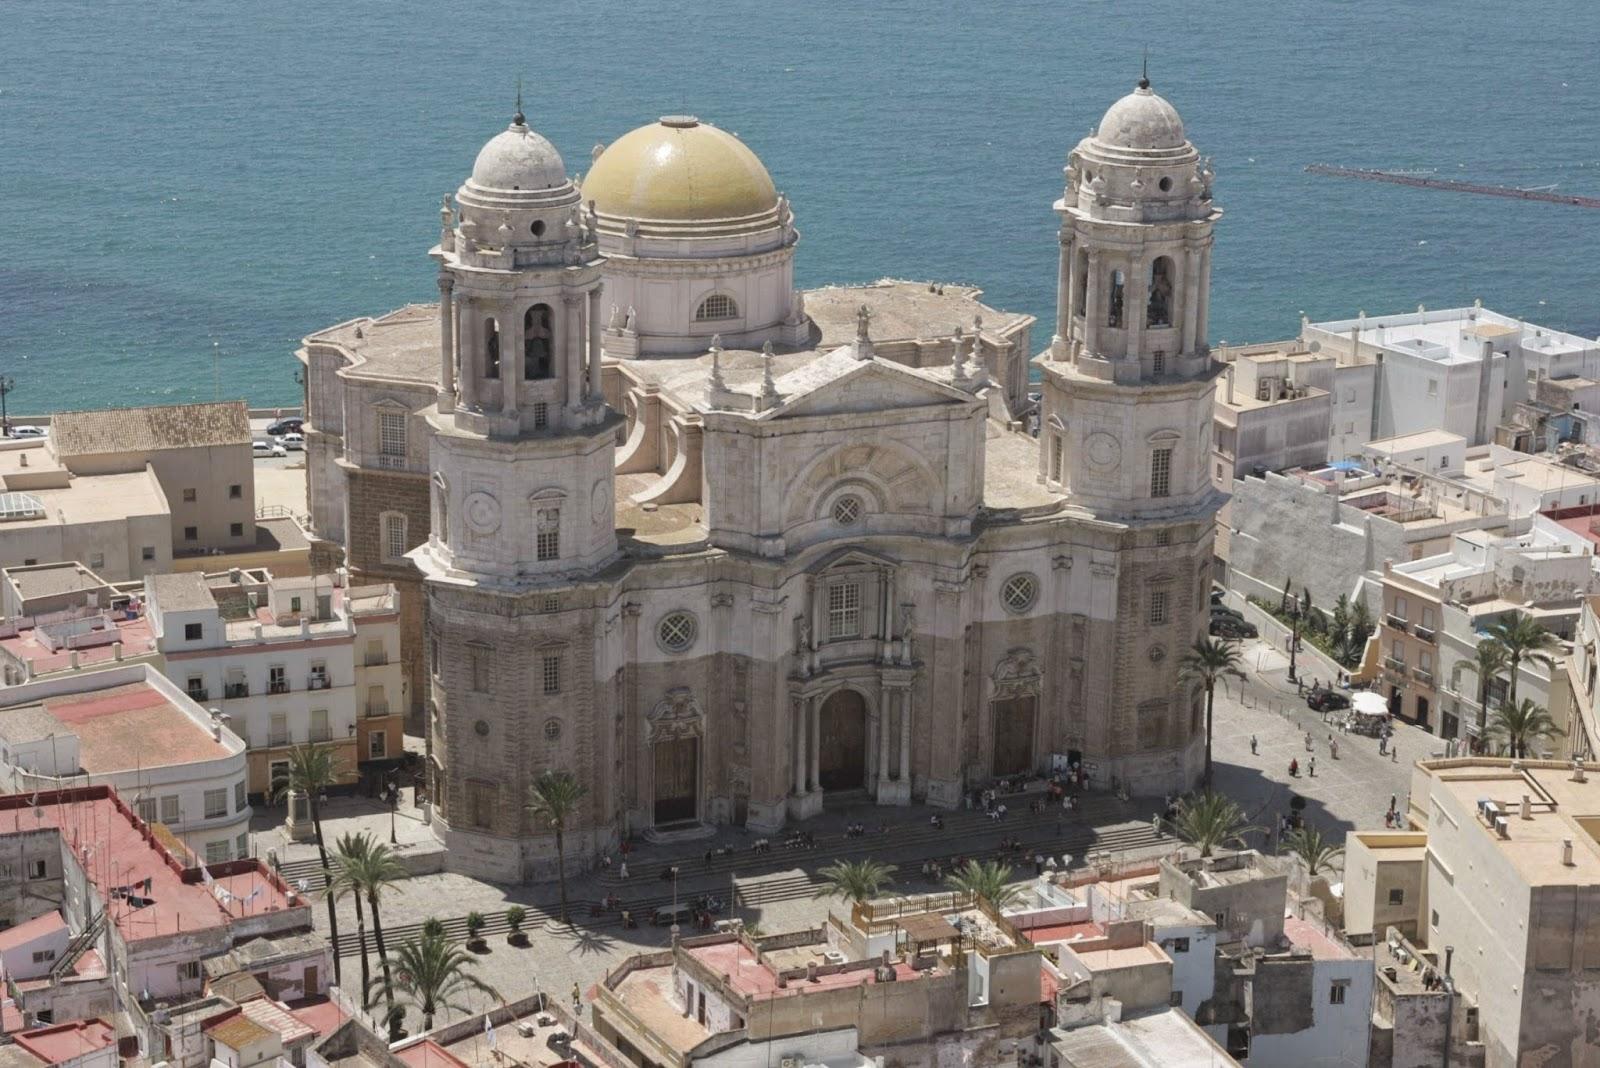 La catedral de Cádiz junto al mar